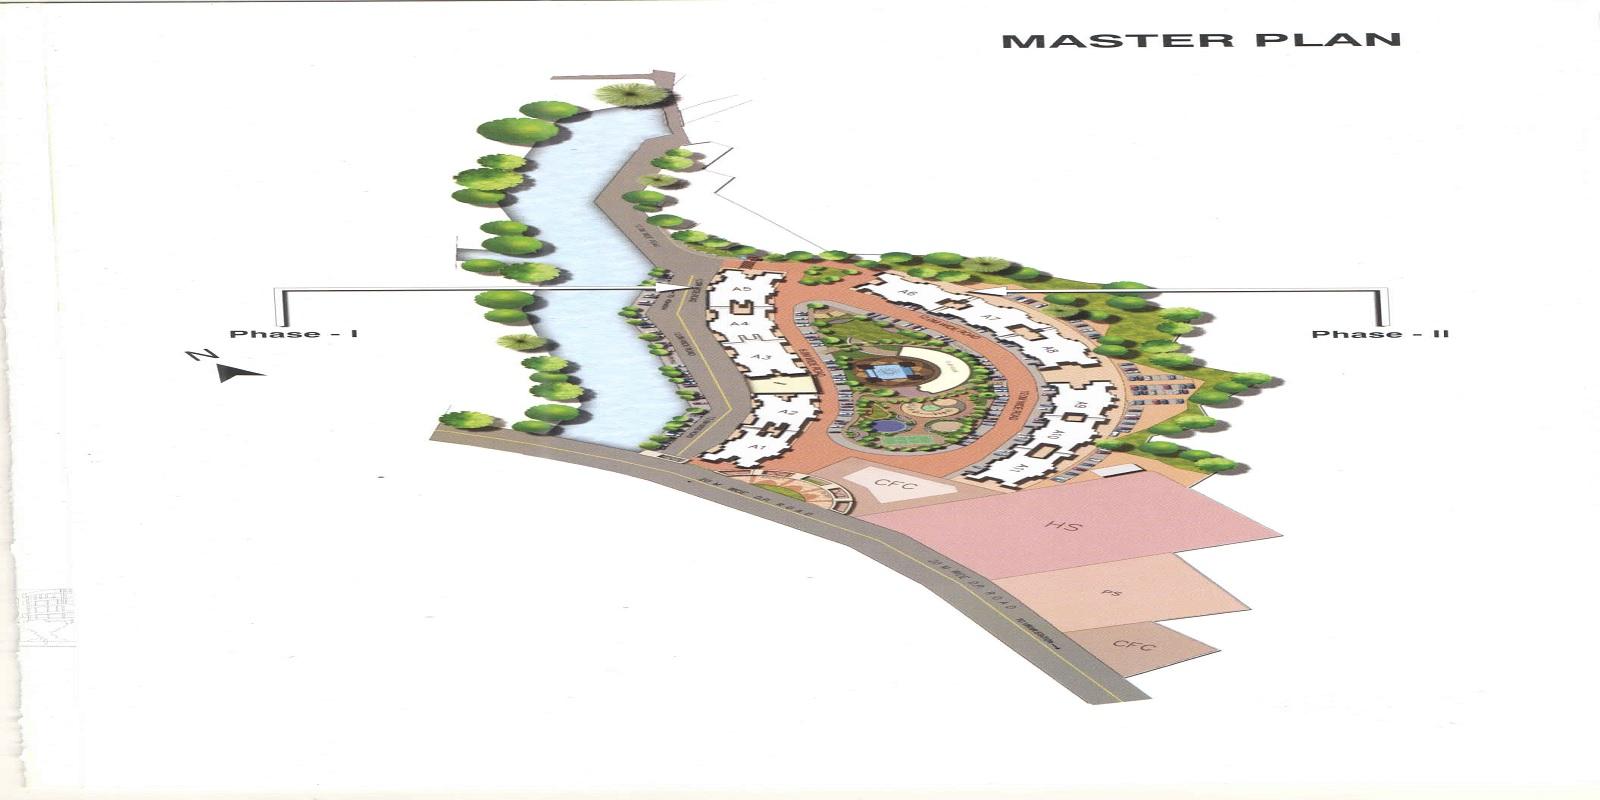 viva city a10 project master plan image1